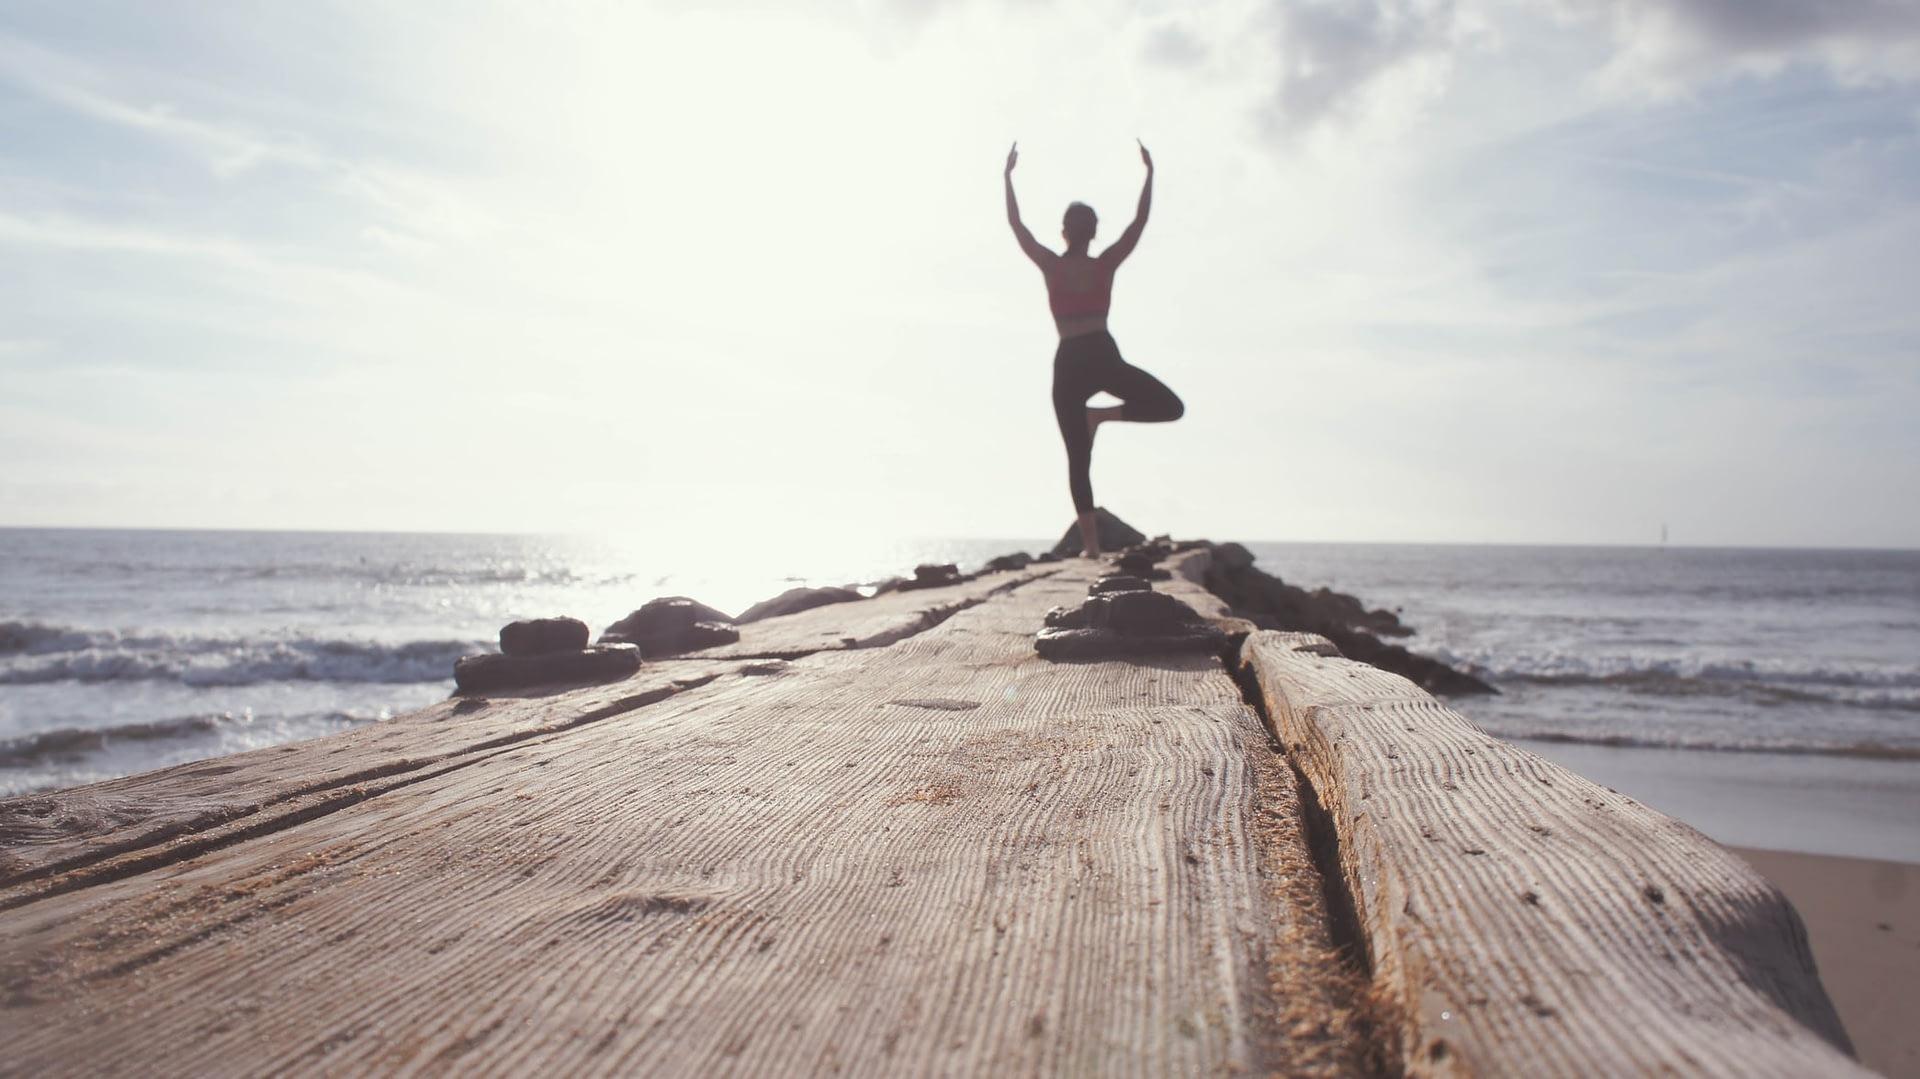 A woman performing morning yoga poses